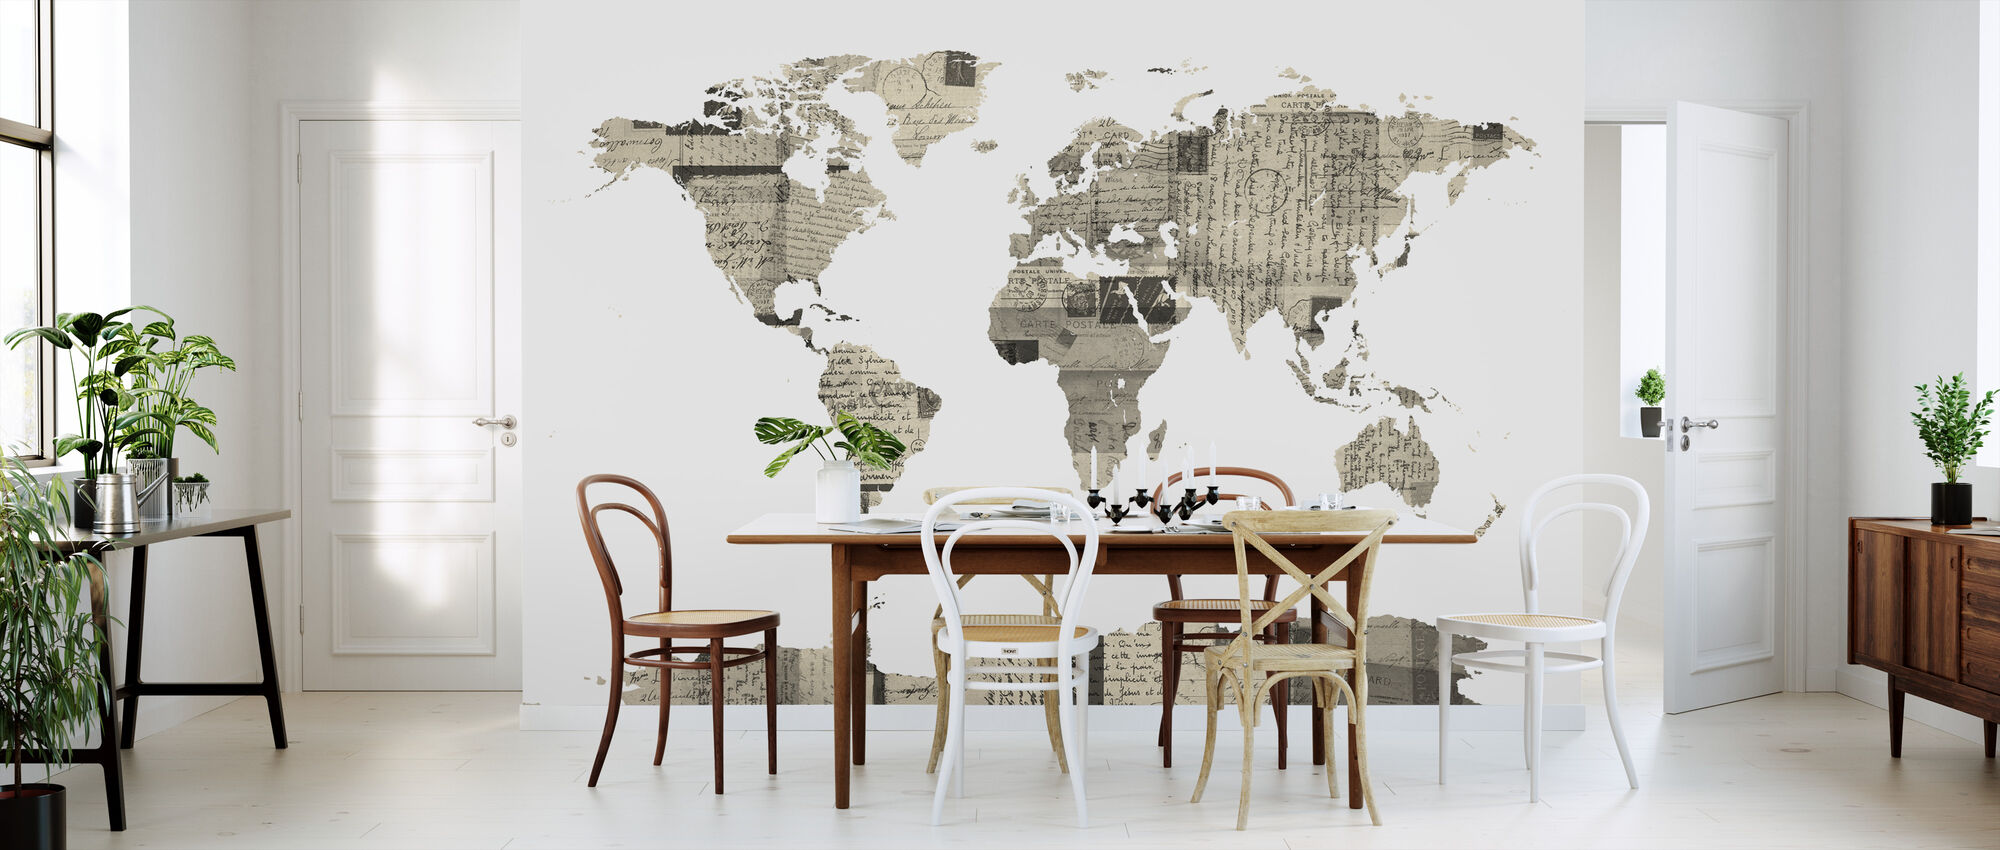 Old Postcards World Map - Wallpaper - Kitchen